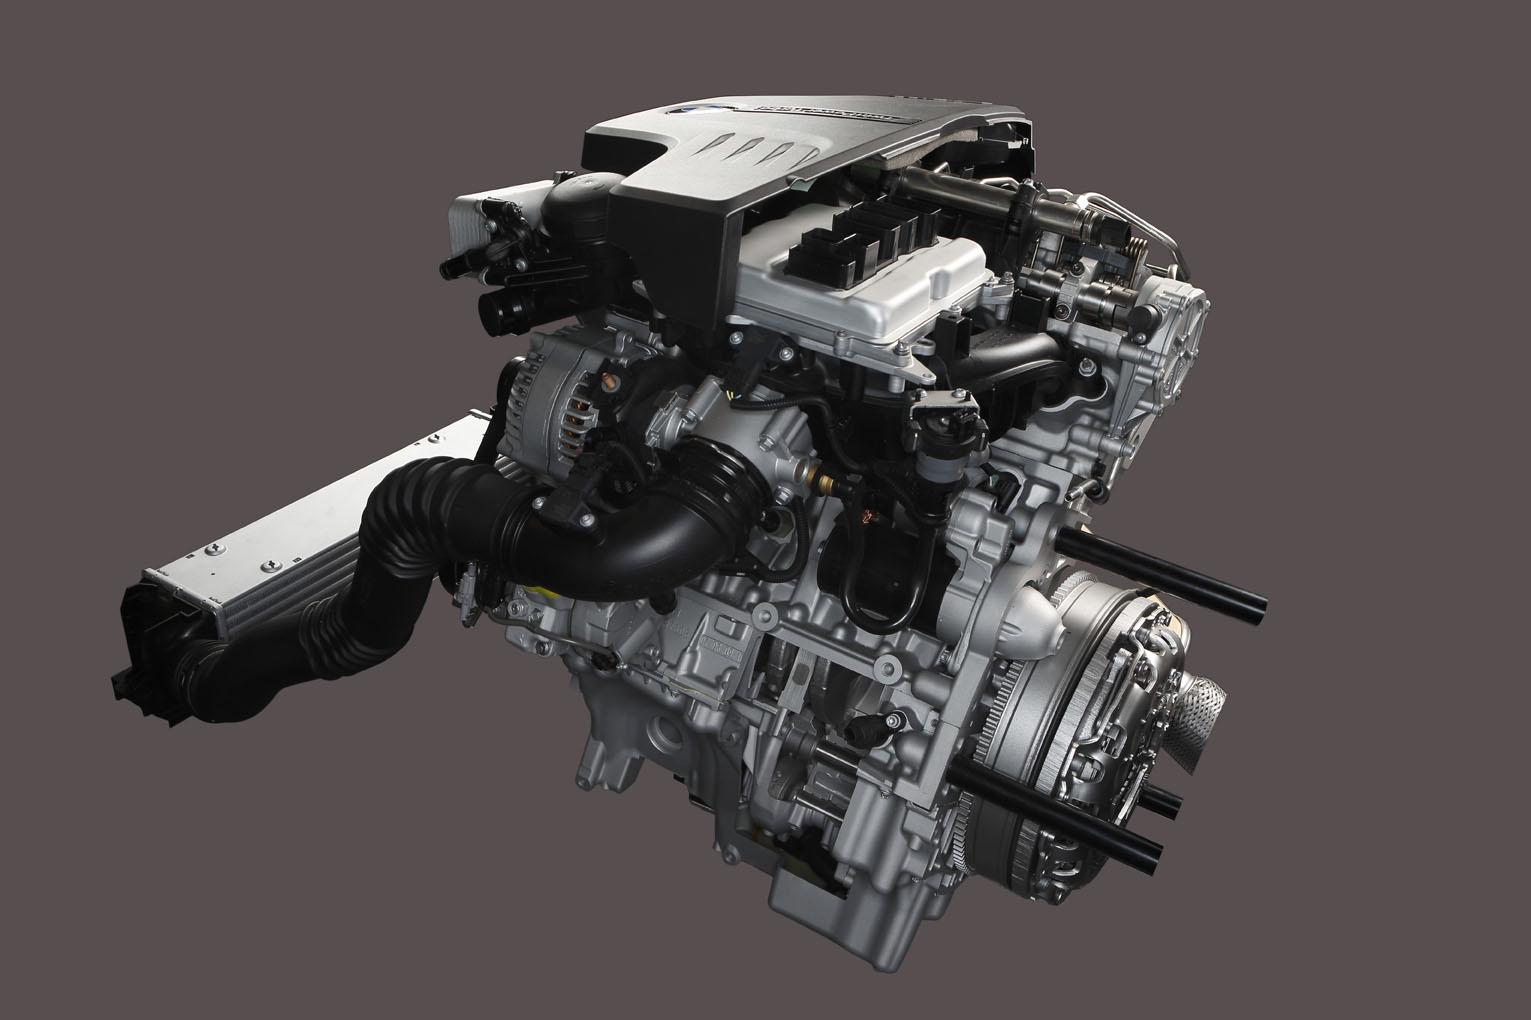 BMW TwinPower Turbo four cylinder petrol engine